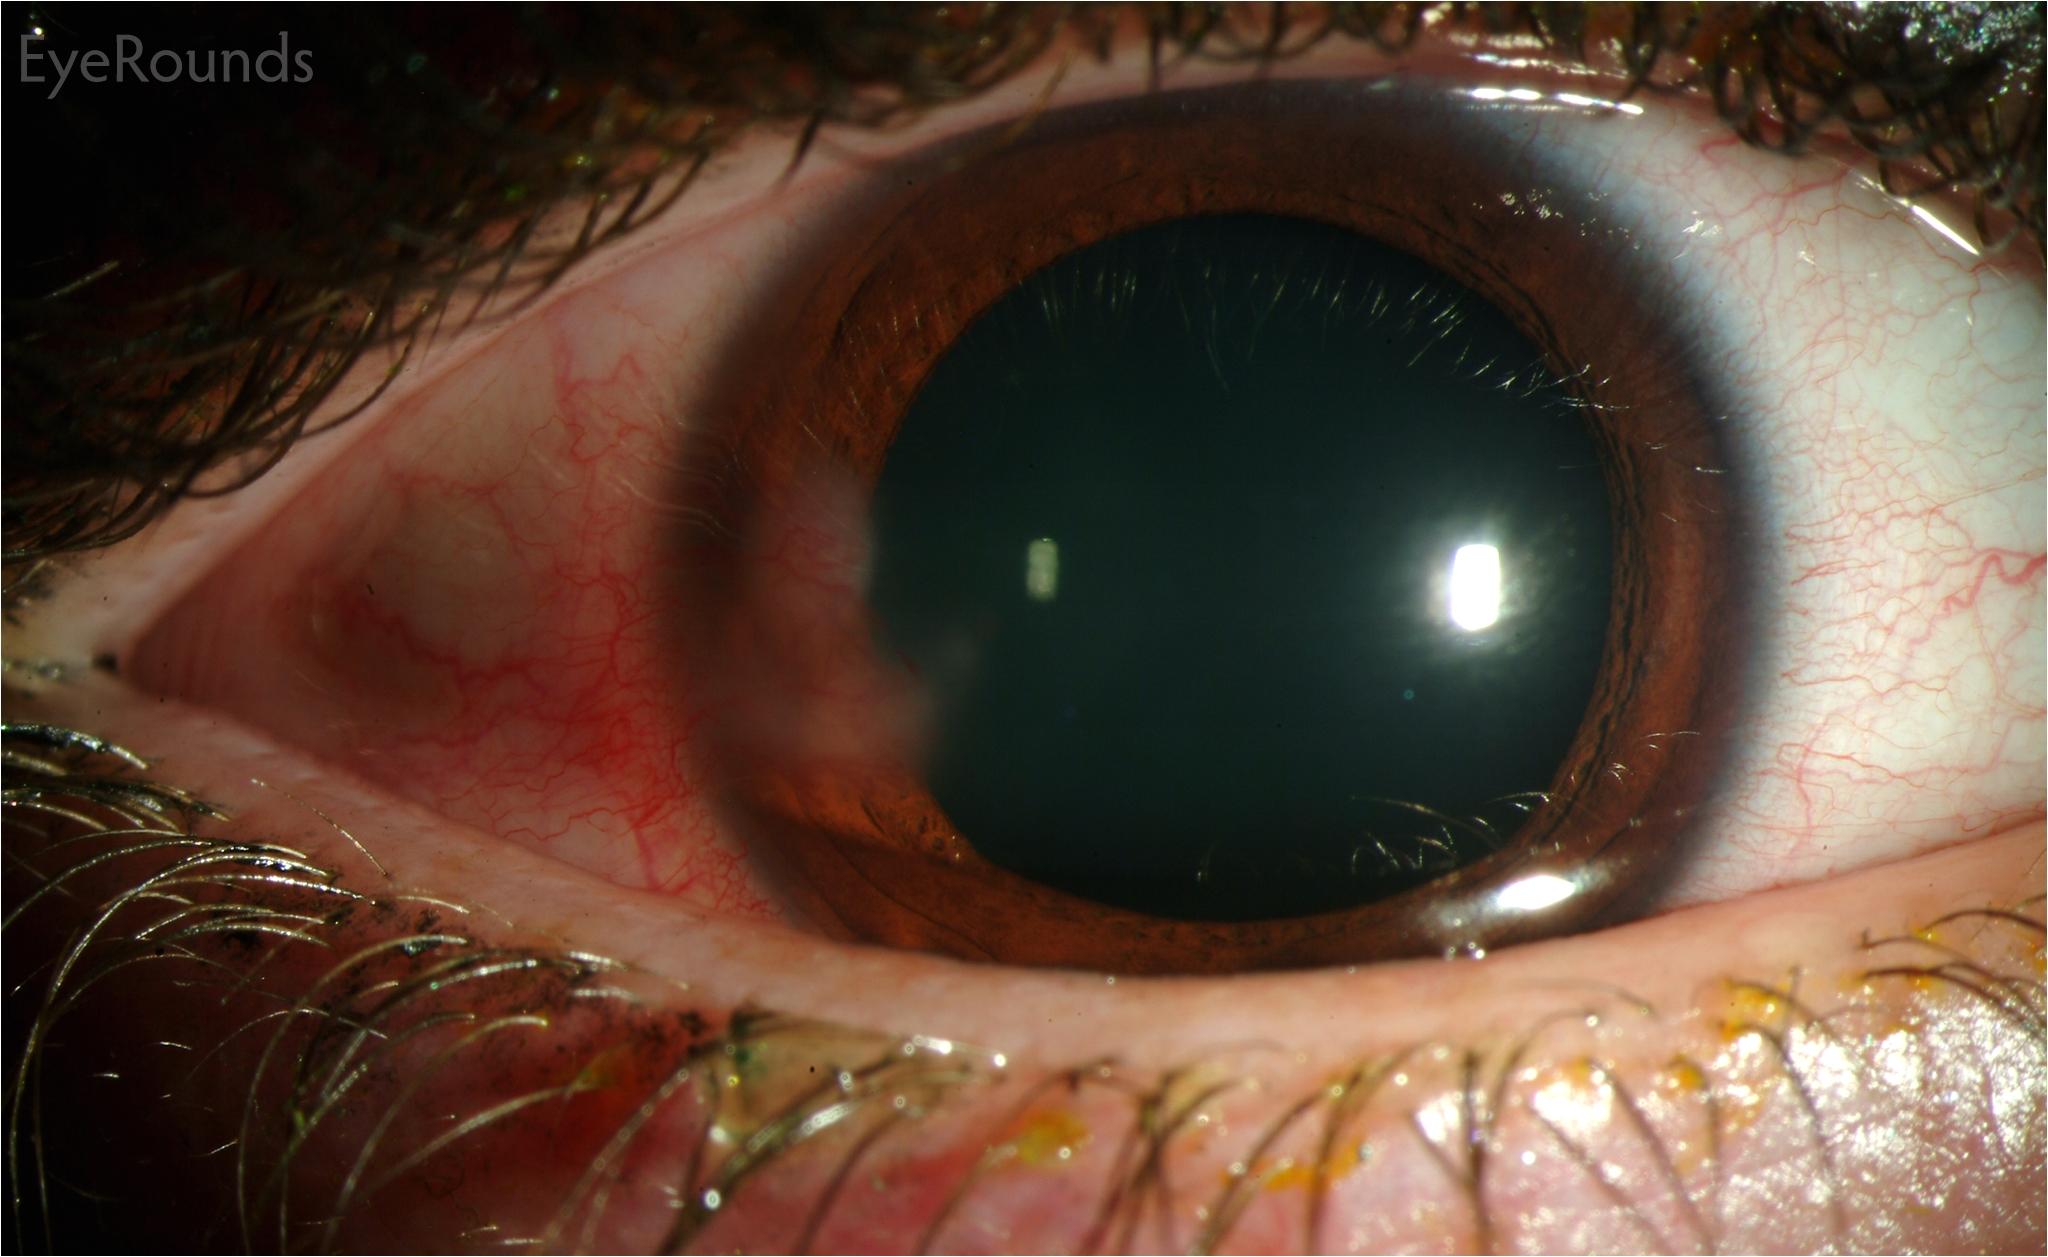 hsv stromal keratitis with resultant stromal vascularization